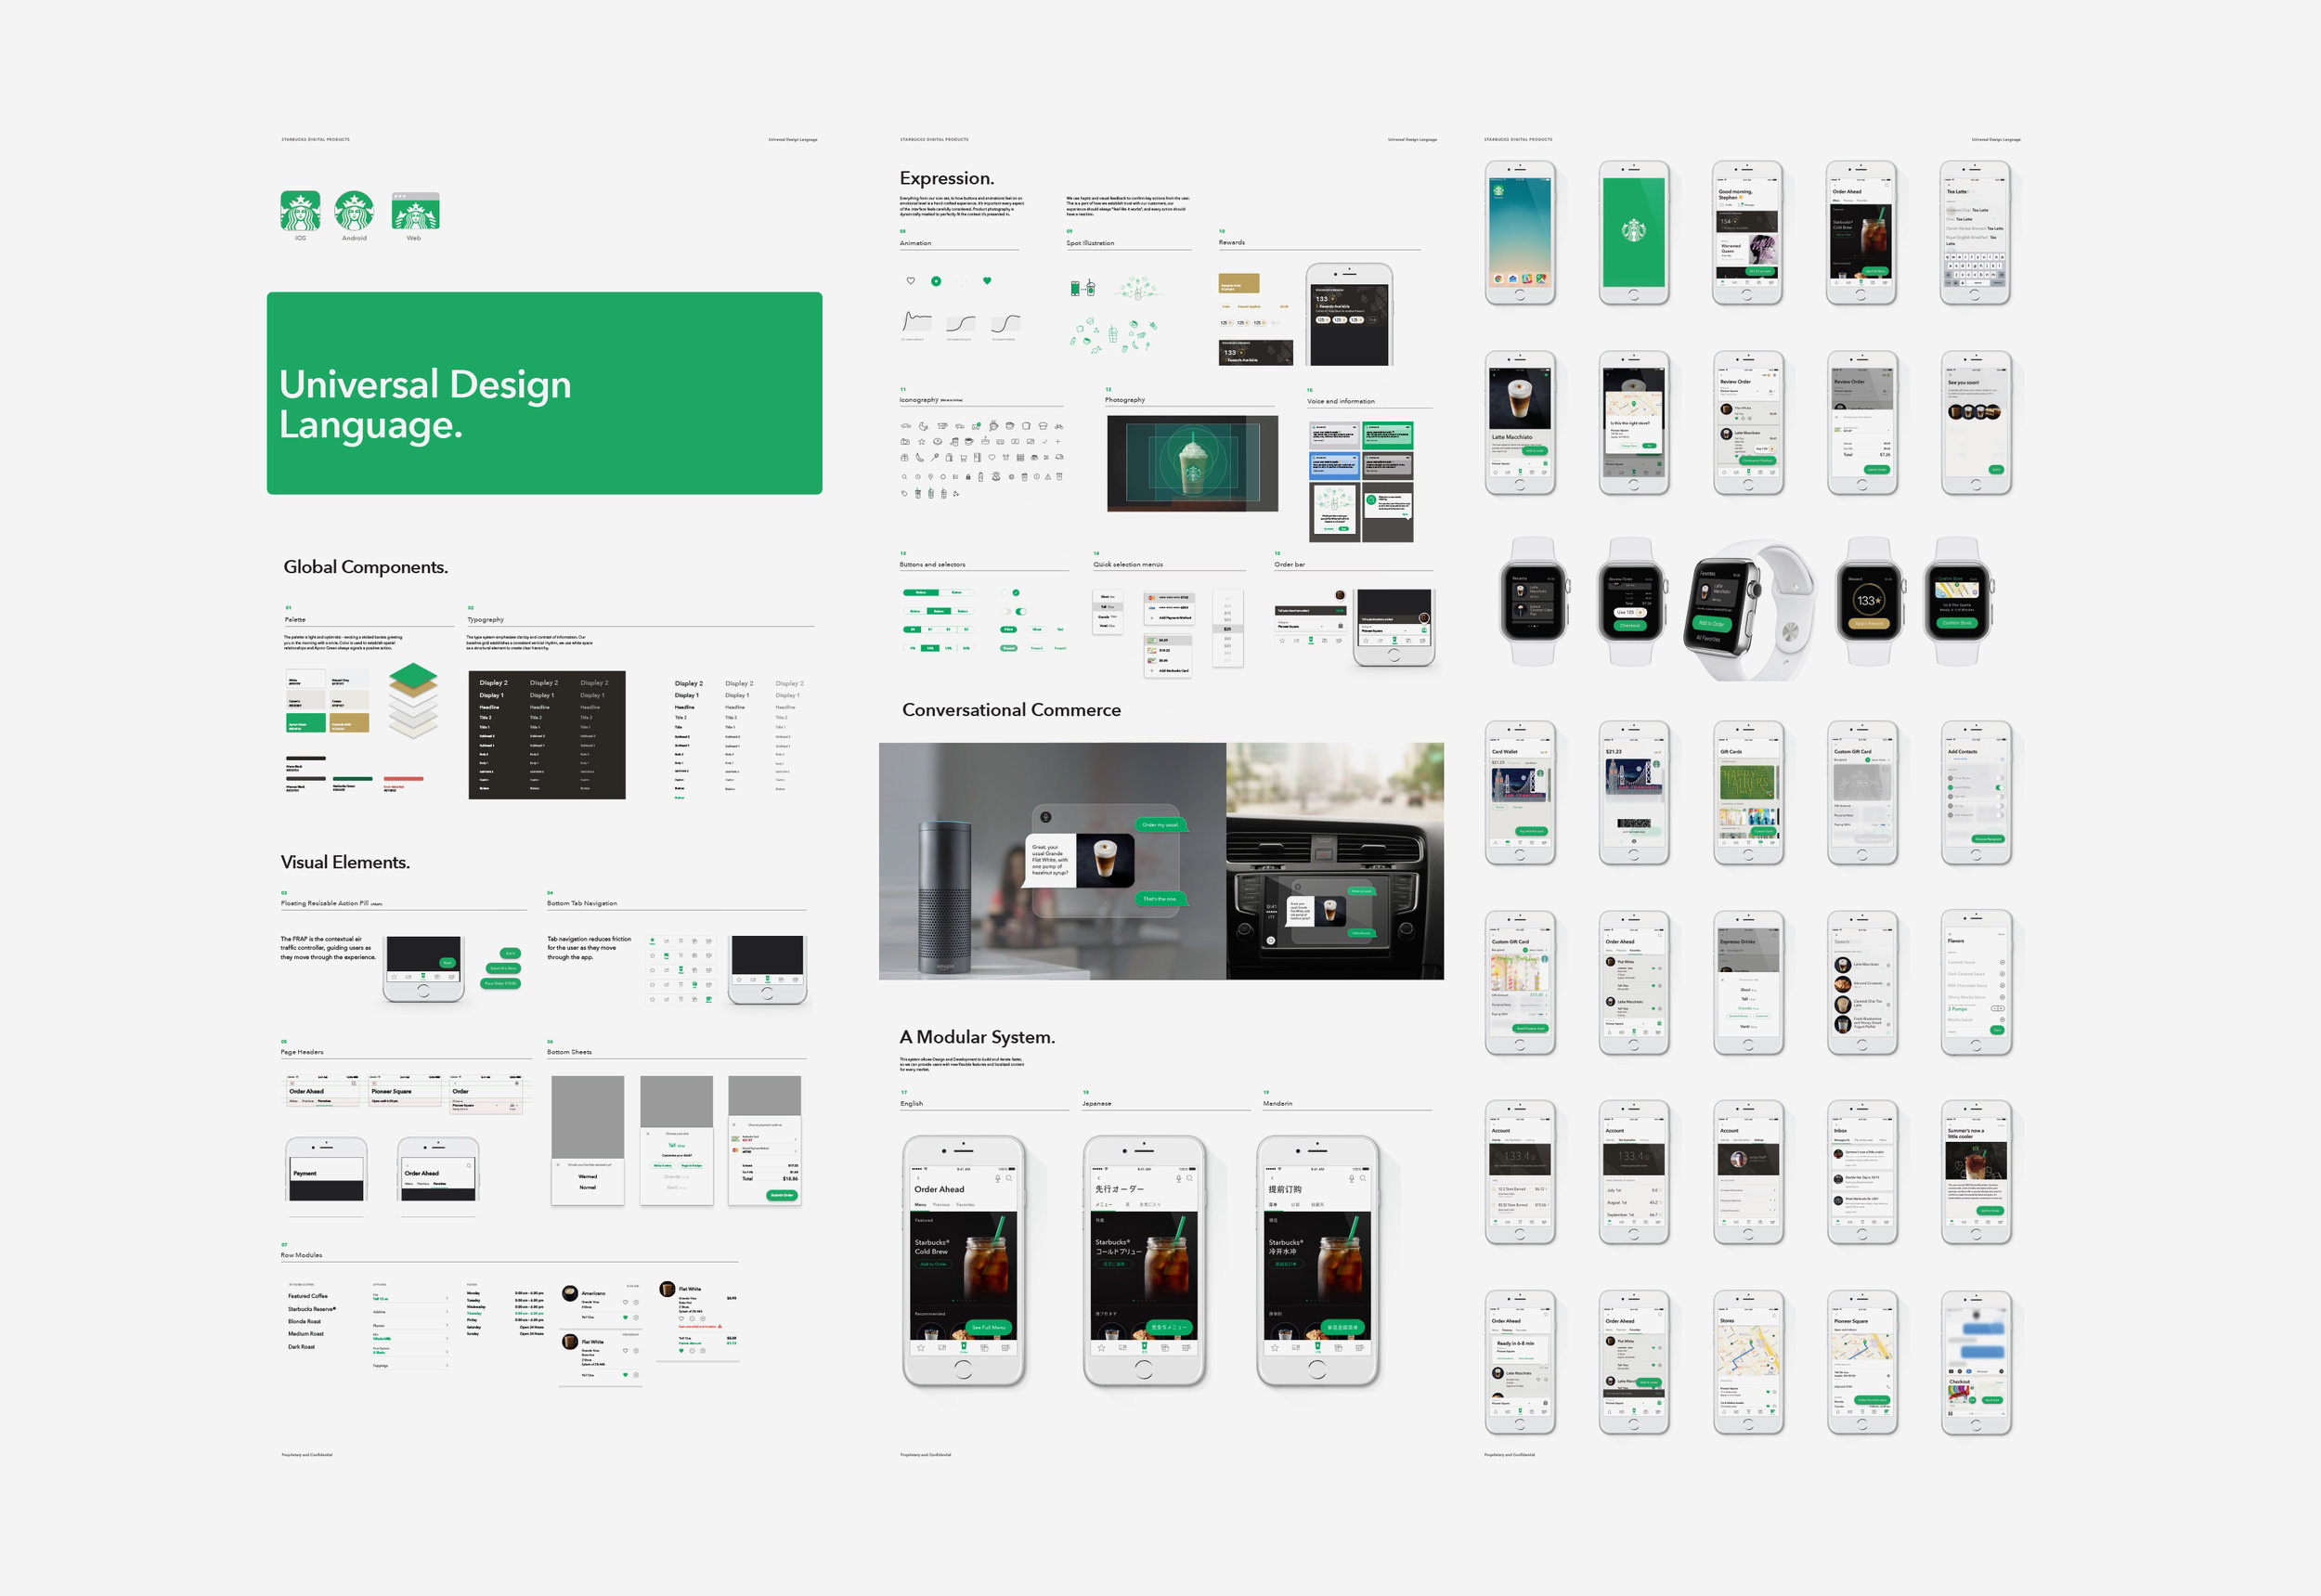 Image of Starbucks Digital Design language